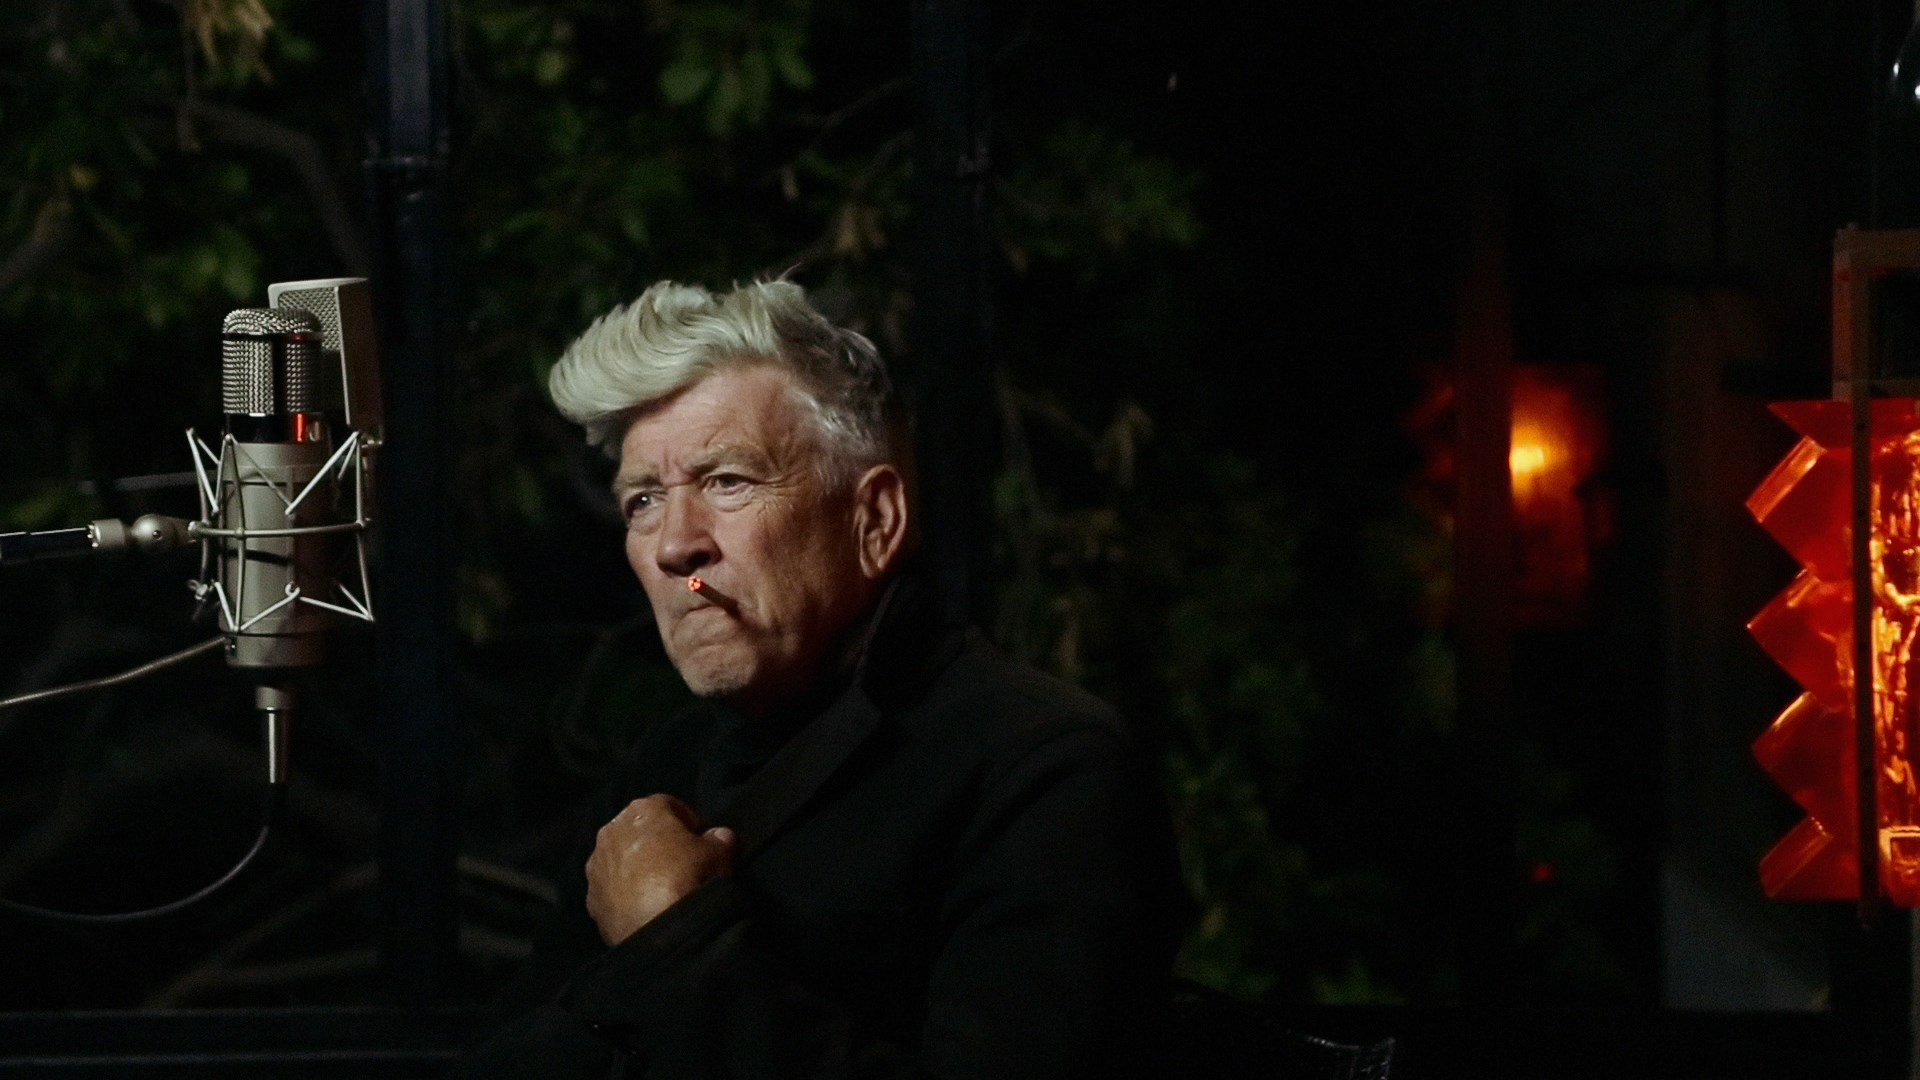 David Lynch The Art Life - Reminiscing